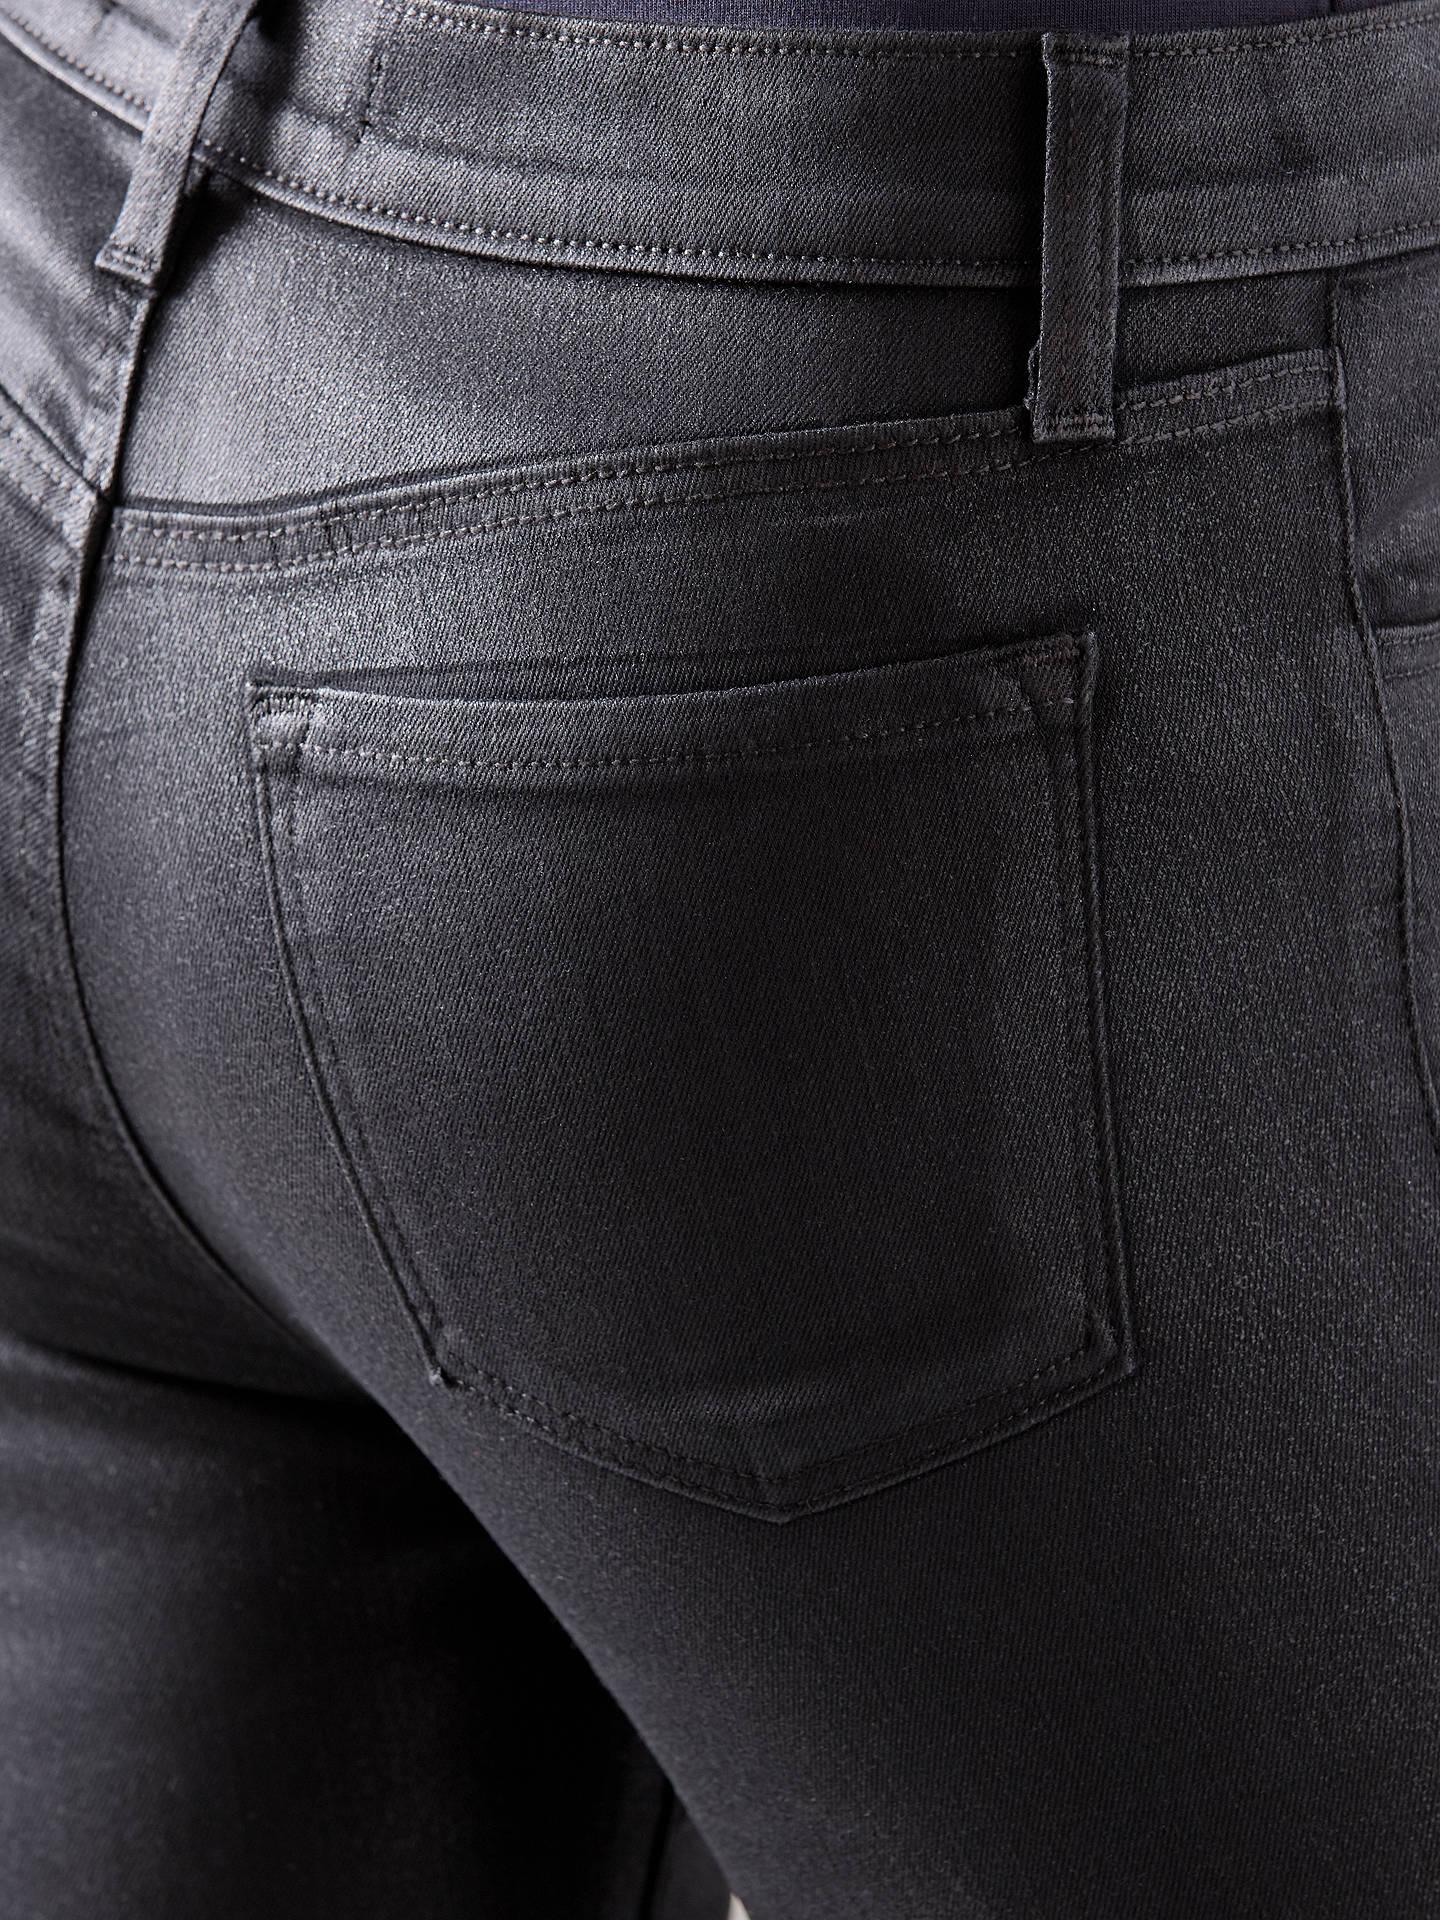 32199c8e7142 ... Buy J Brand 620 Mid Rise Super Skinny Jeans